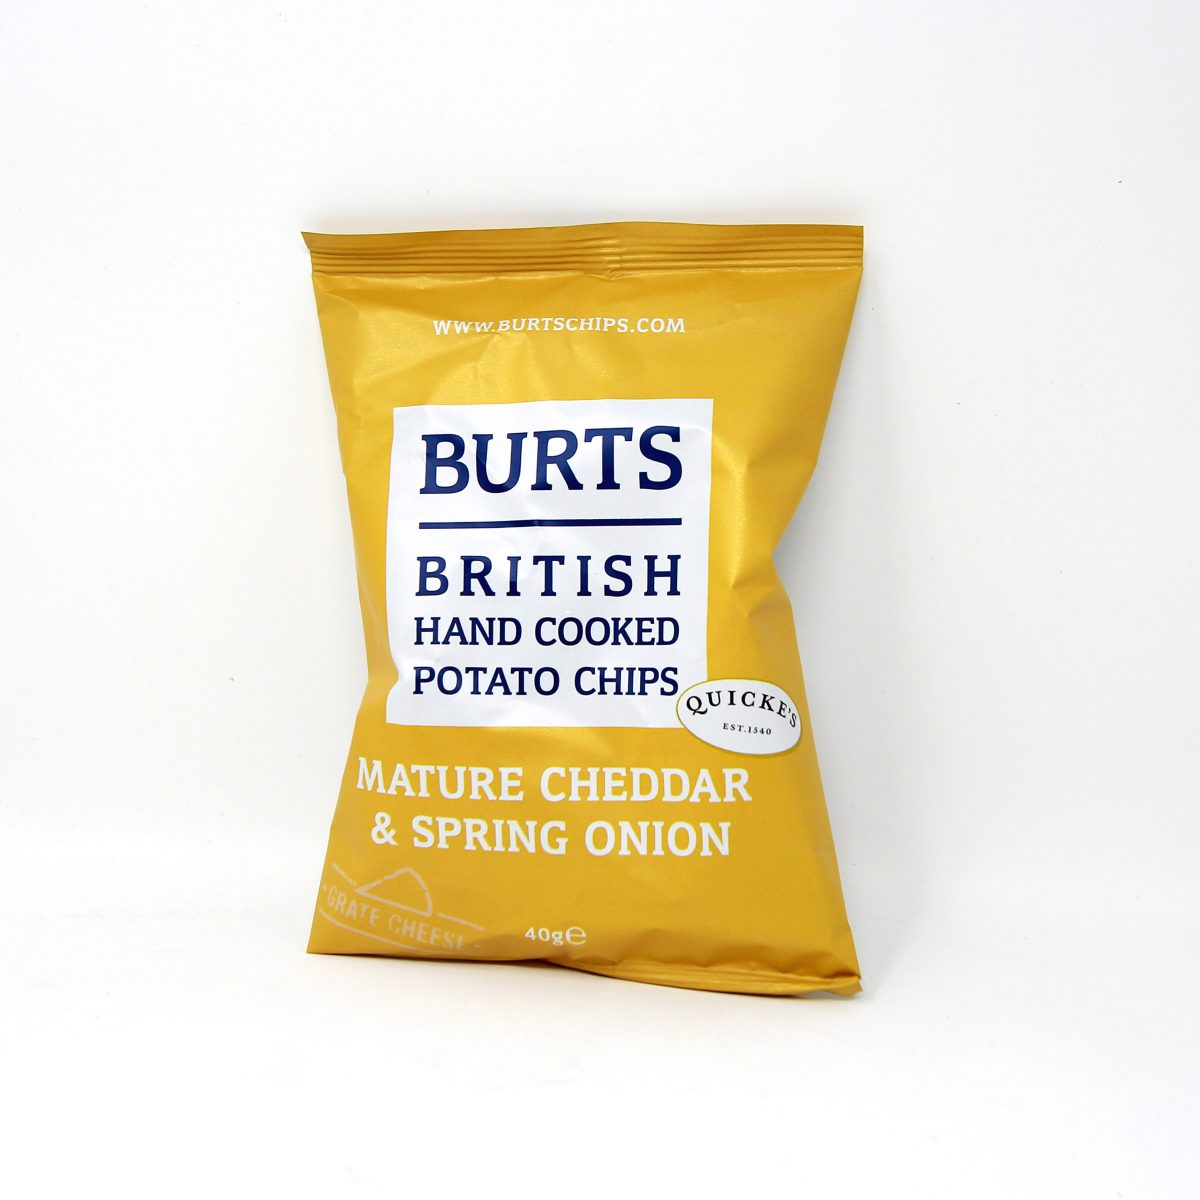 Burts-Mature-Cheddar-&-Spring-Onion-Chips